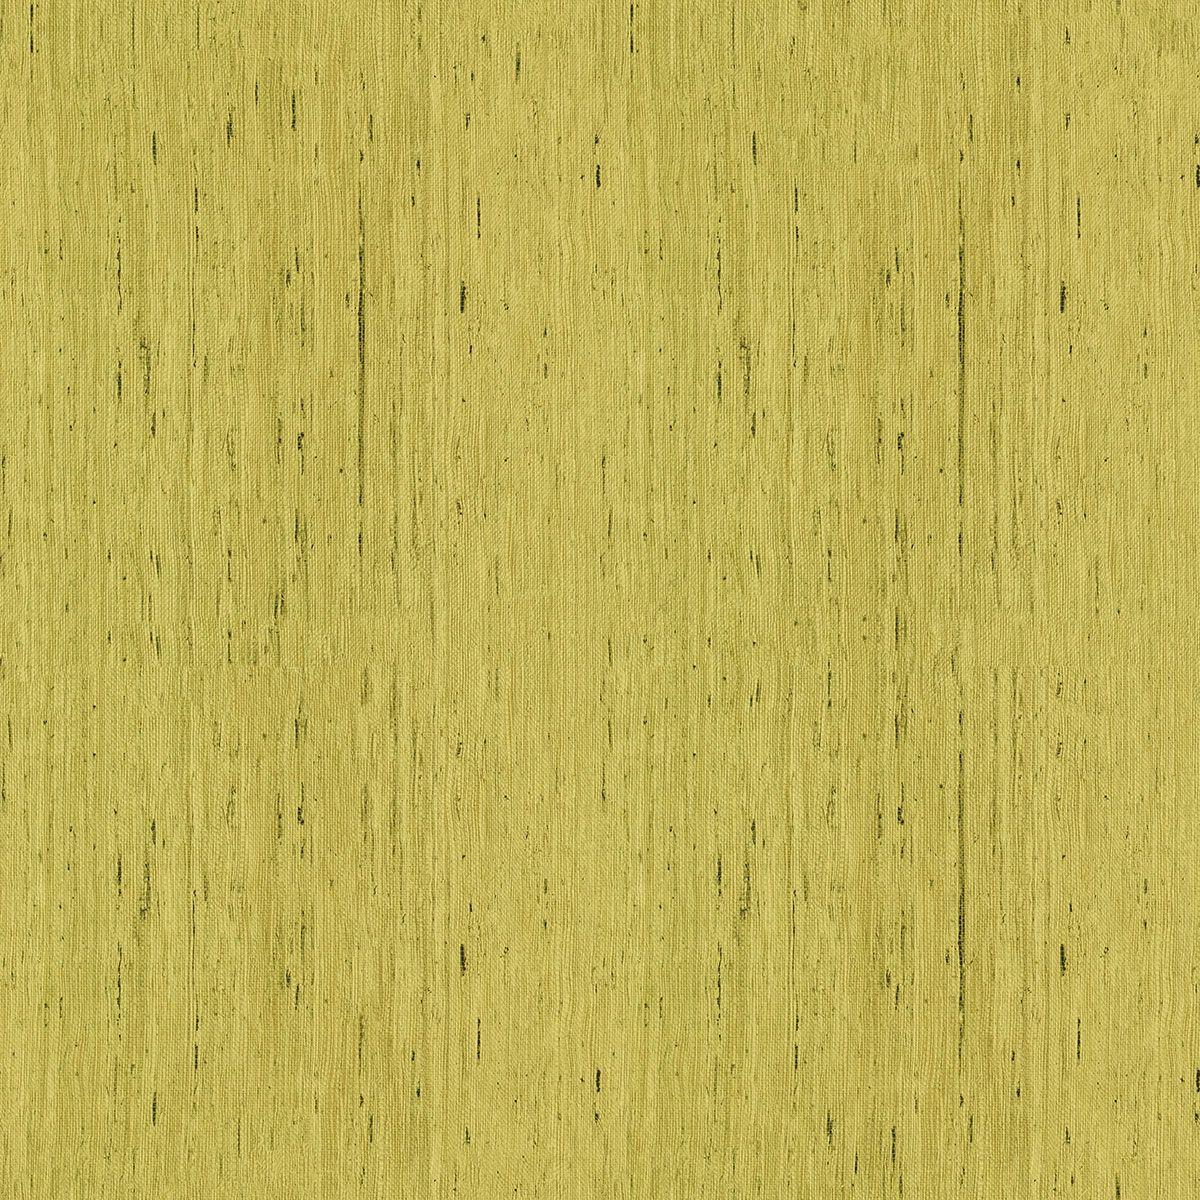 Lime Grasscloth Laminate Kitchen Laminate Countertops Countertops